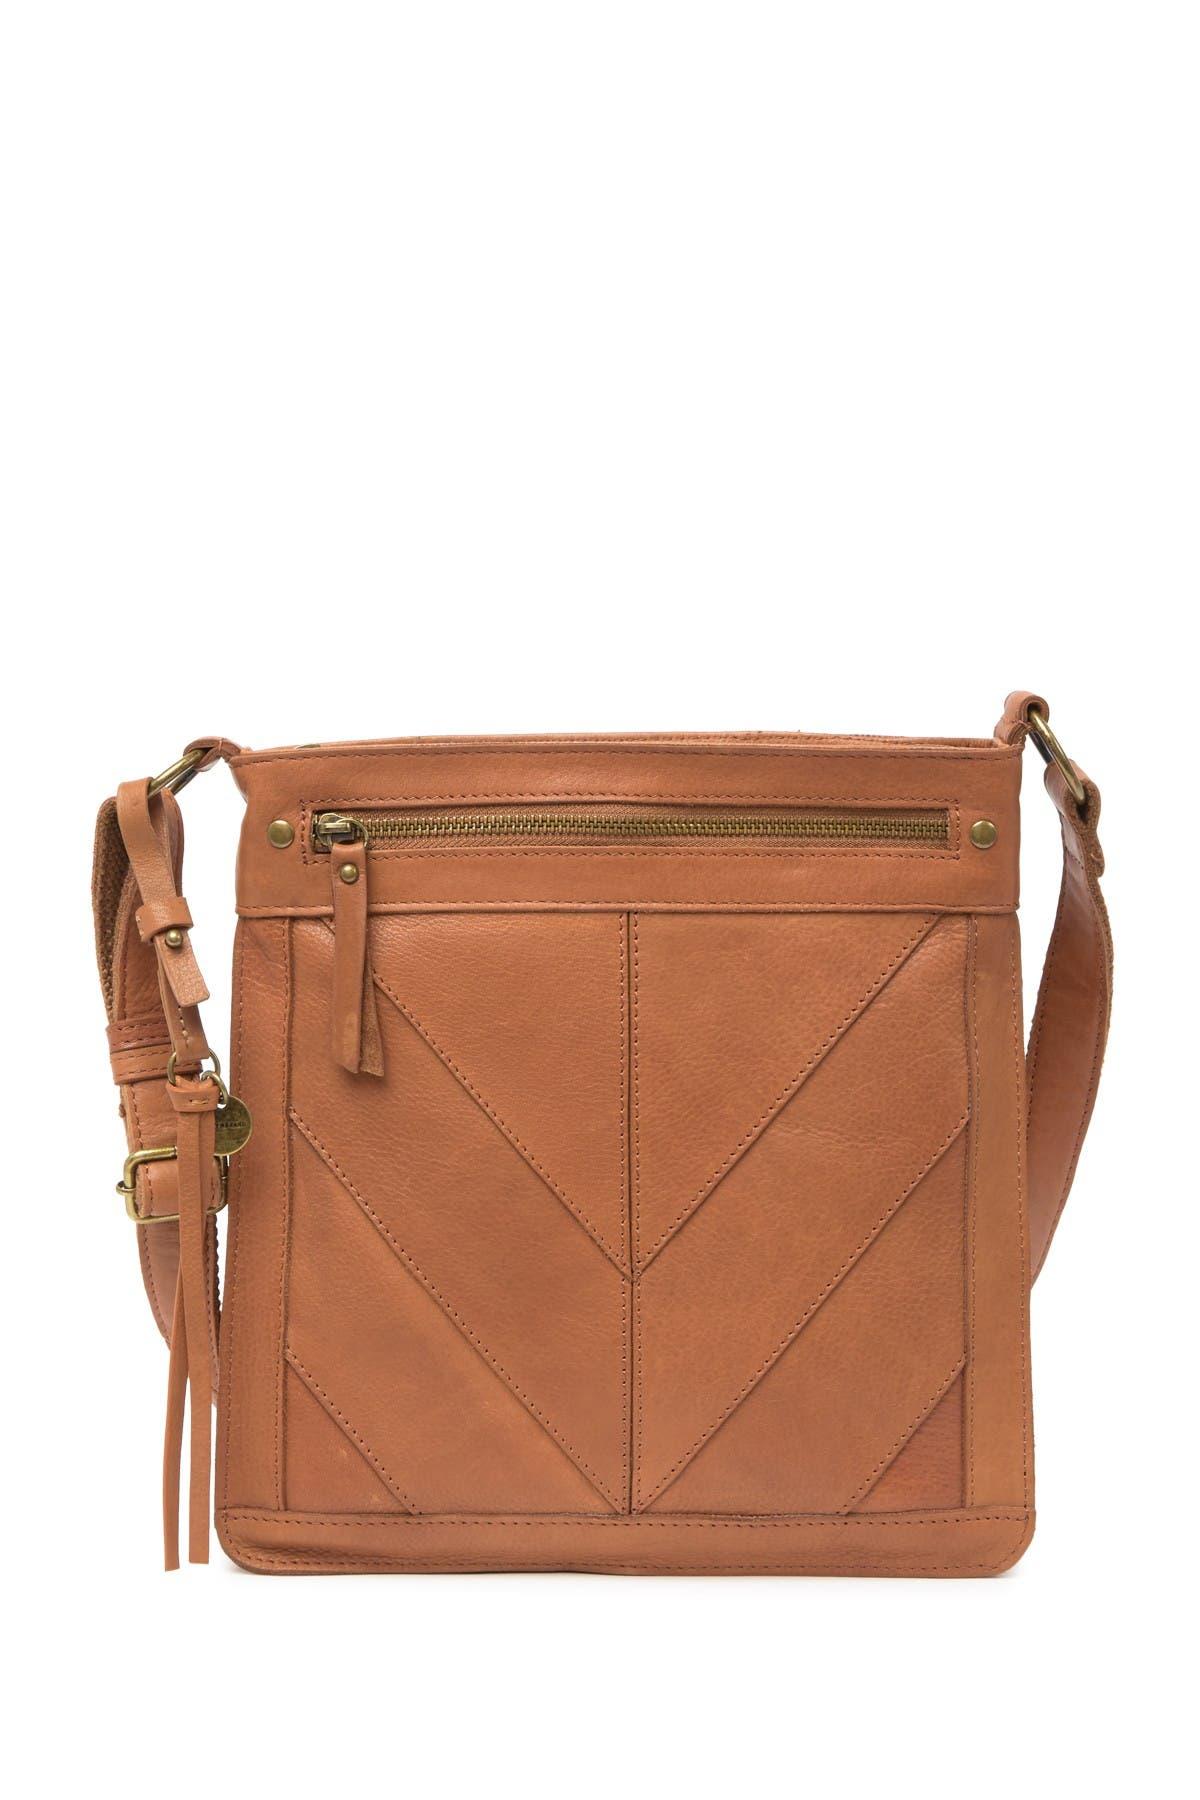 Image of Lucky Brand Rayla Crossbody Bag